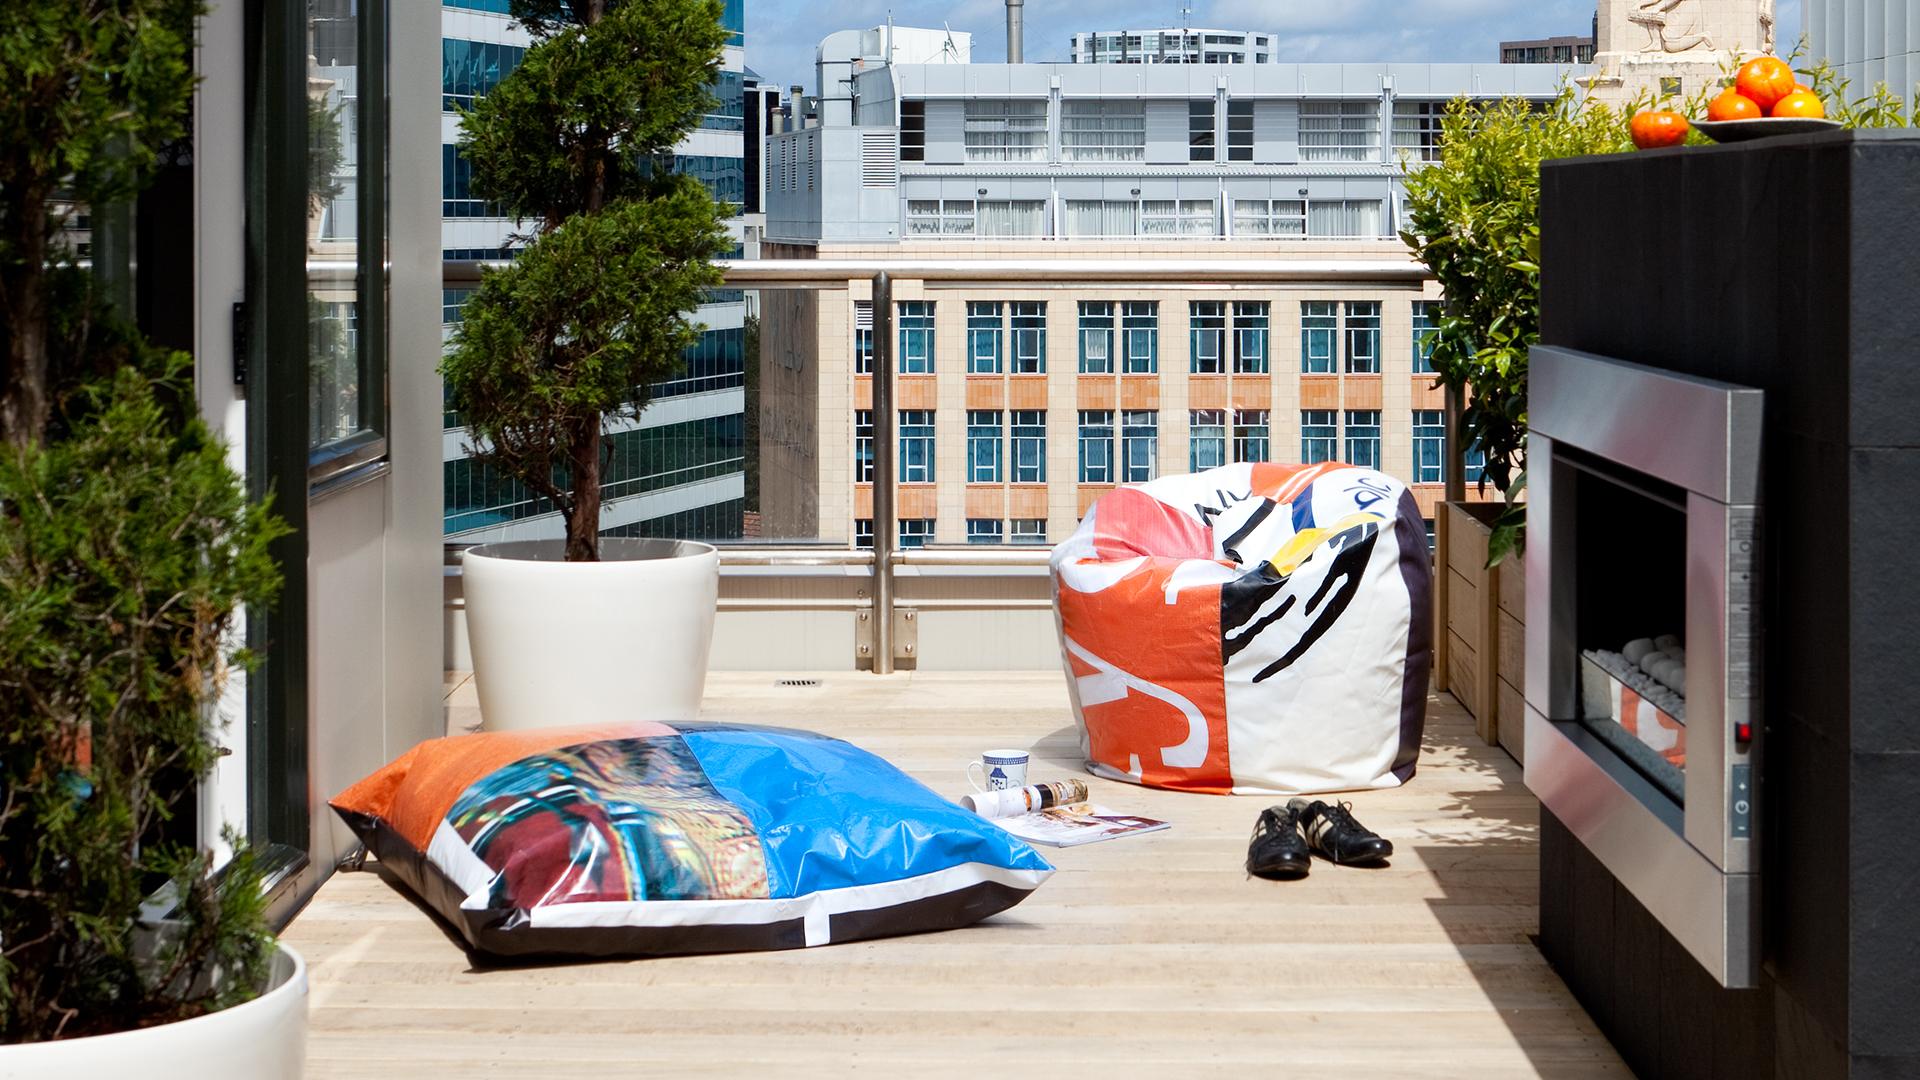 An interior designer's urban rooftop oasis